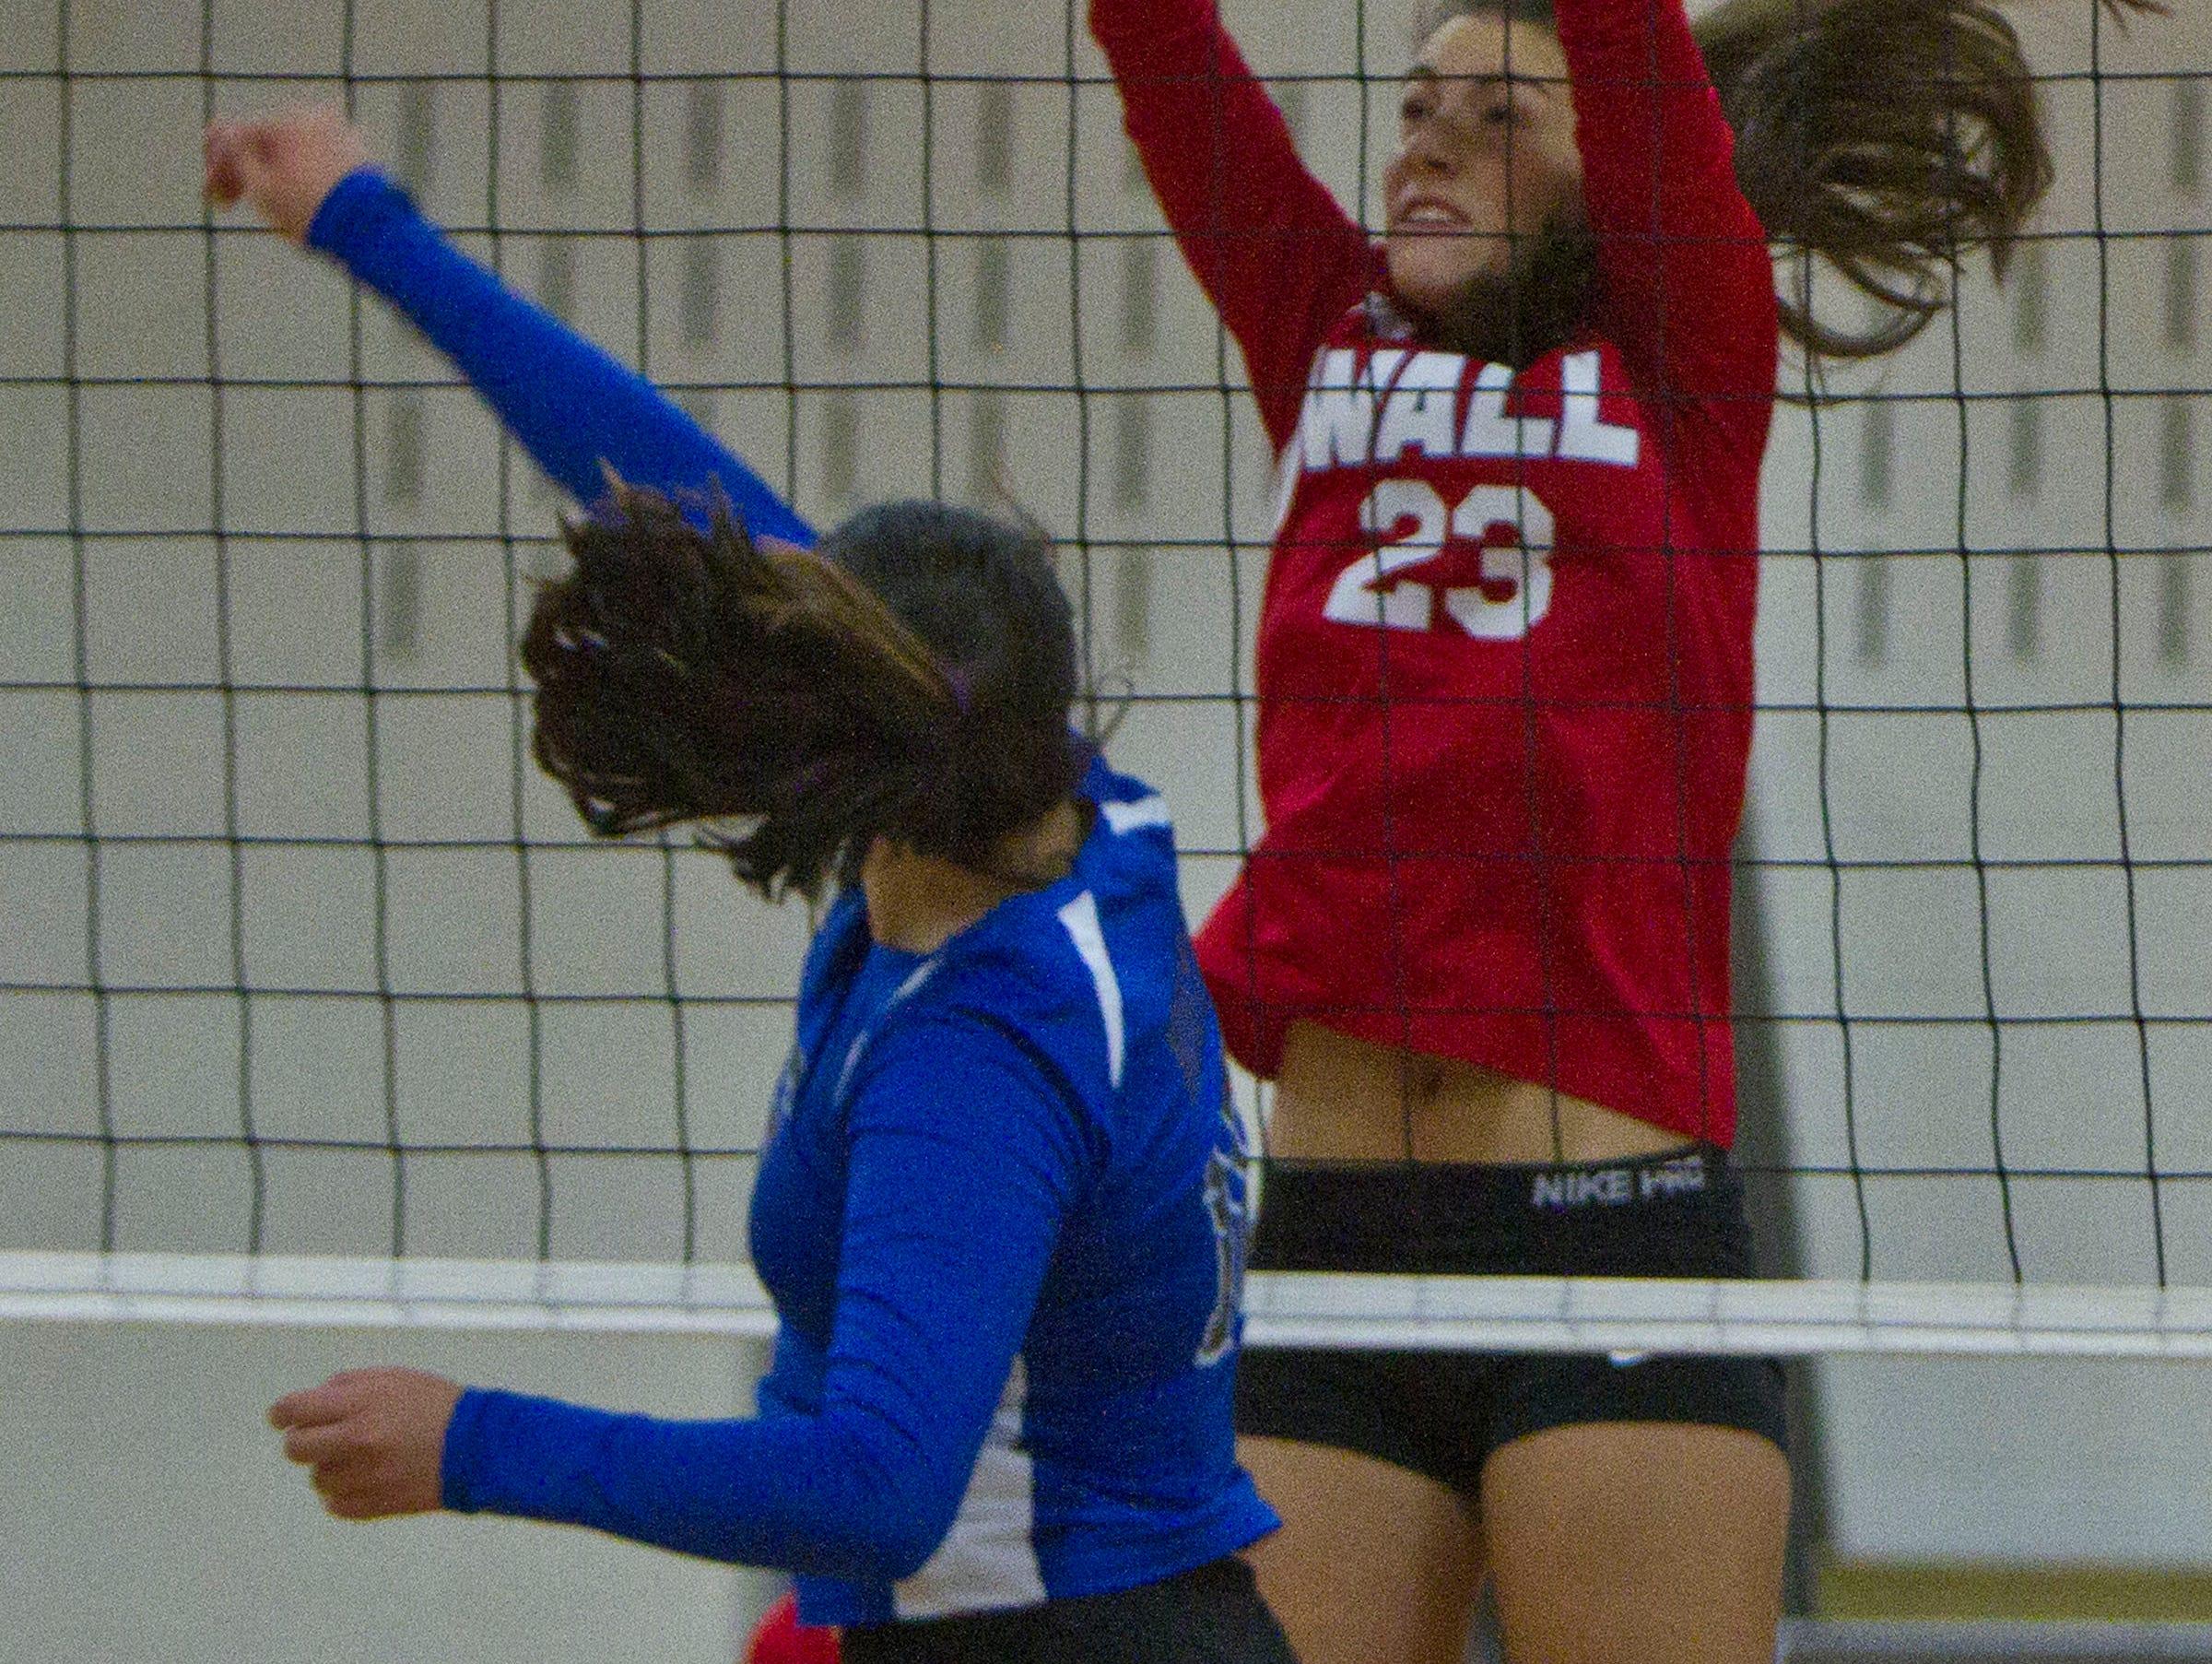 Wall's Tara Casuccio blocks a shot by Windsor's Carolyn Vaca. NJSIAA volleyball match between Wall and West Windsor Plainsboro North. Wall Township, NJ Wednesday, November 4, 2015 @dhoodhood